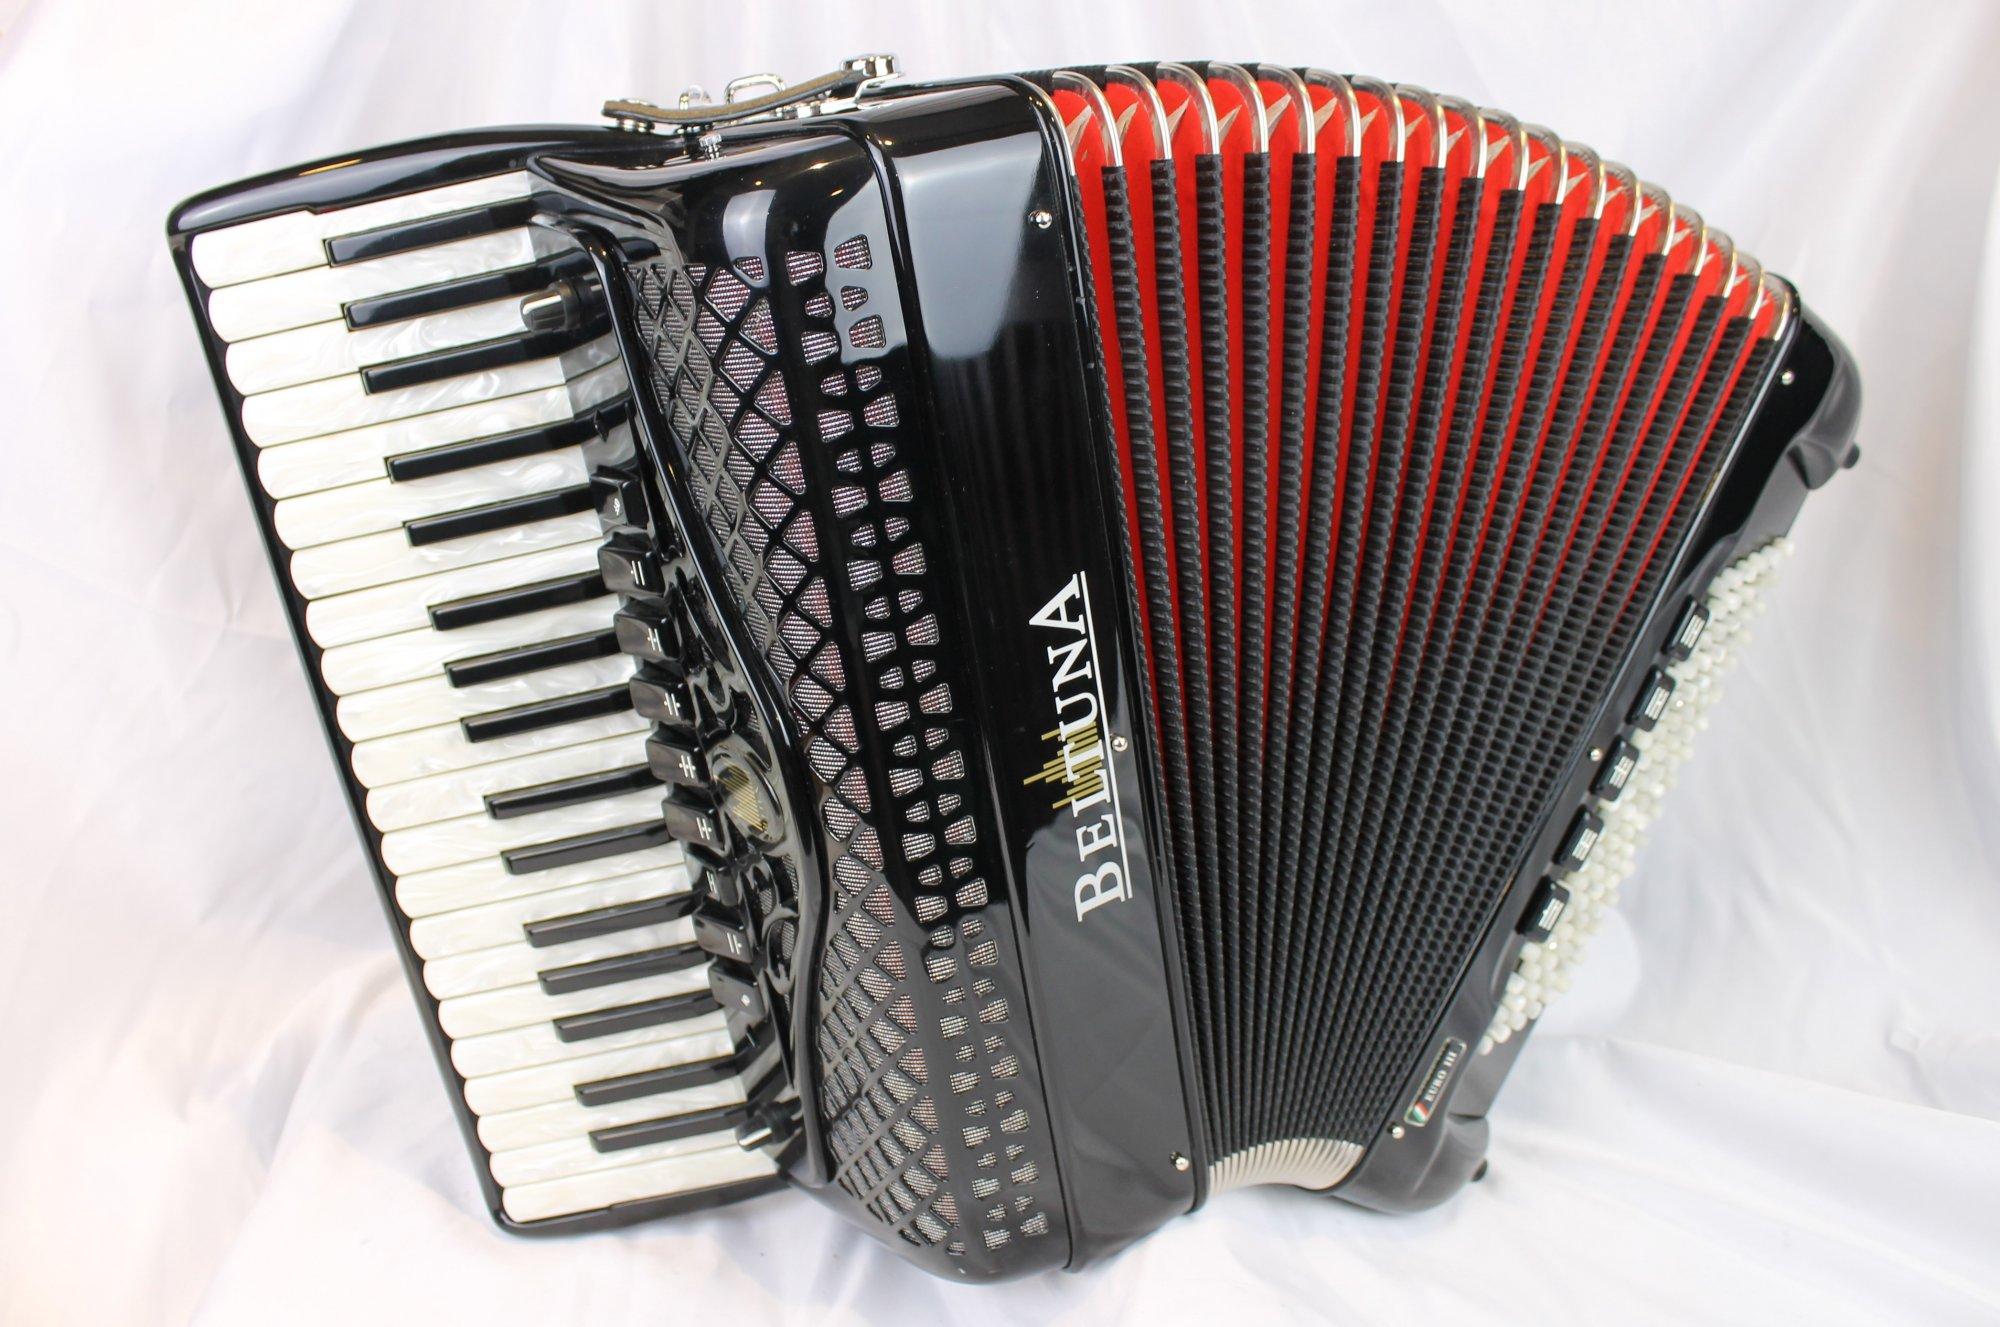 5015 - Like New Black Beltuna Euro III Piano Accordion LMH 37 96